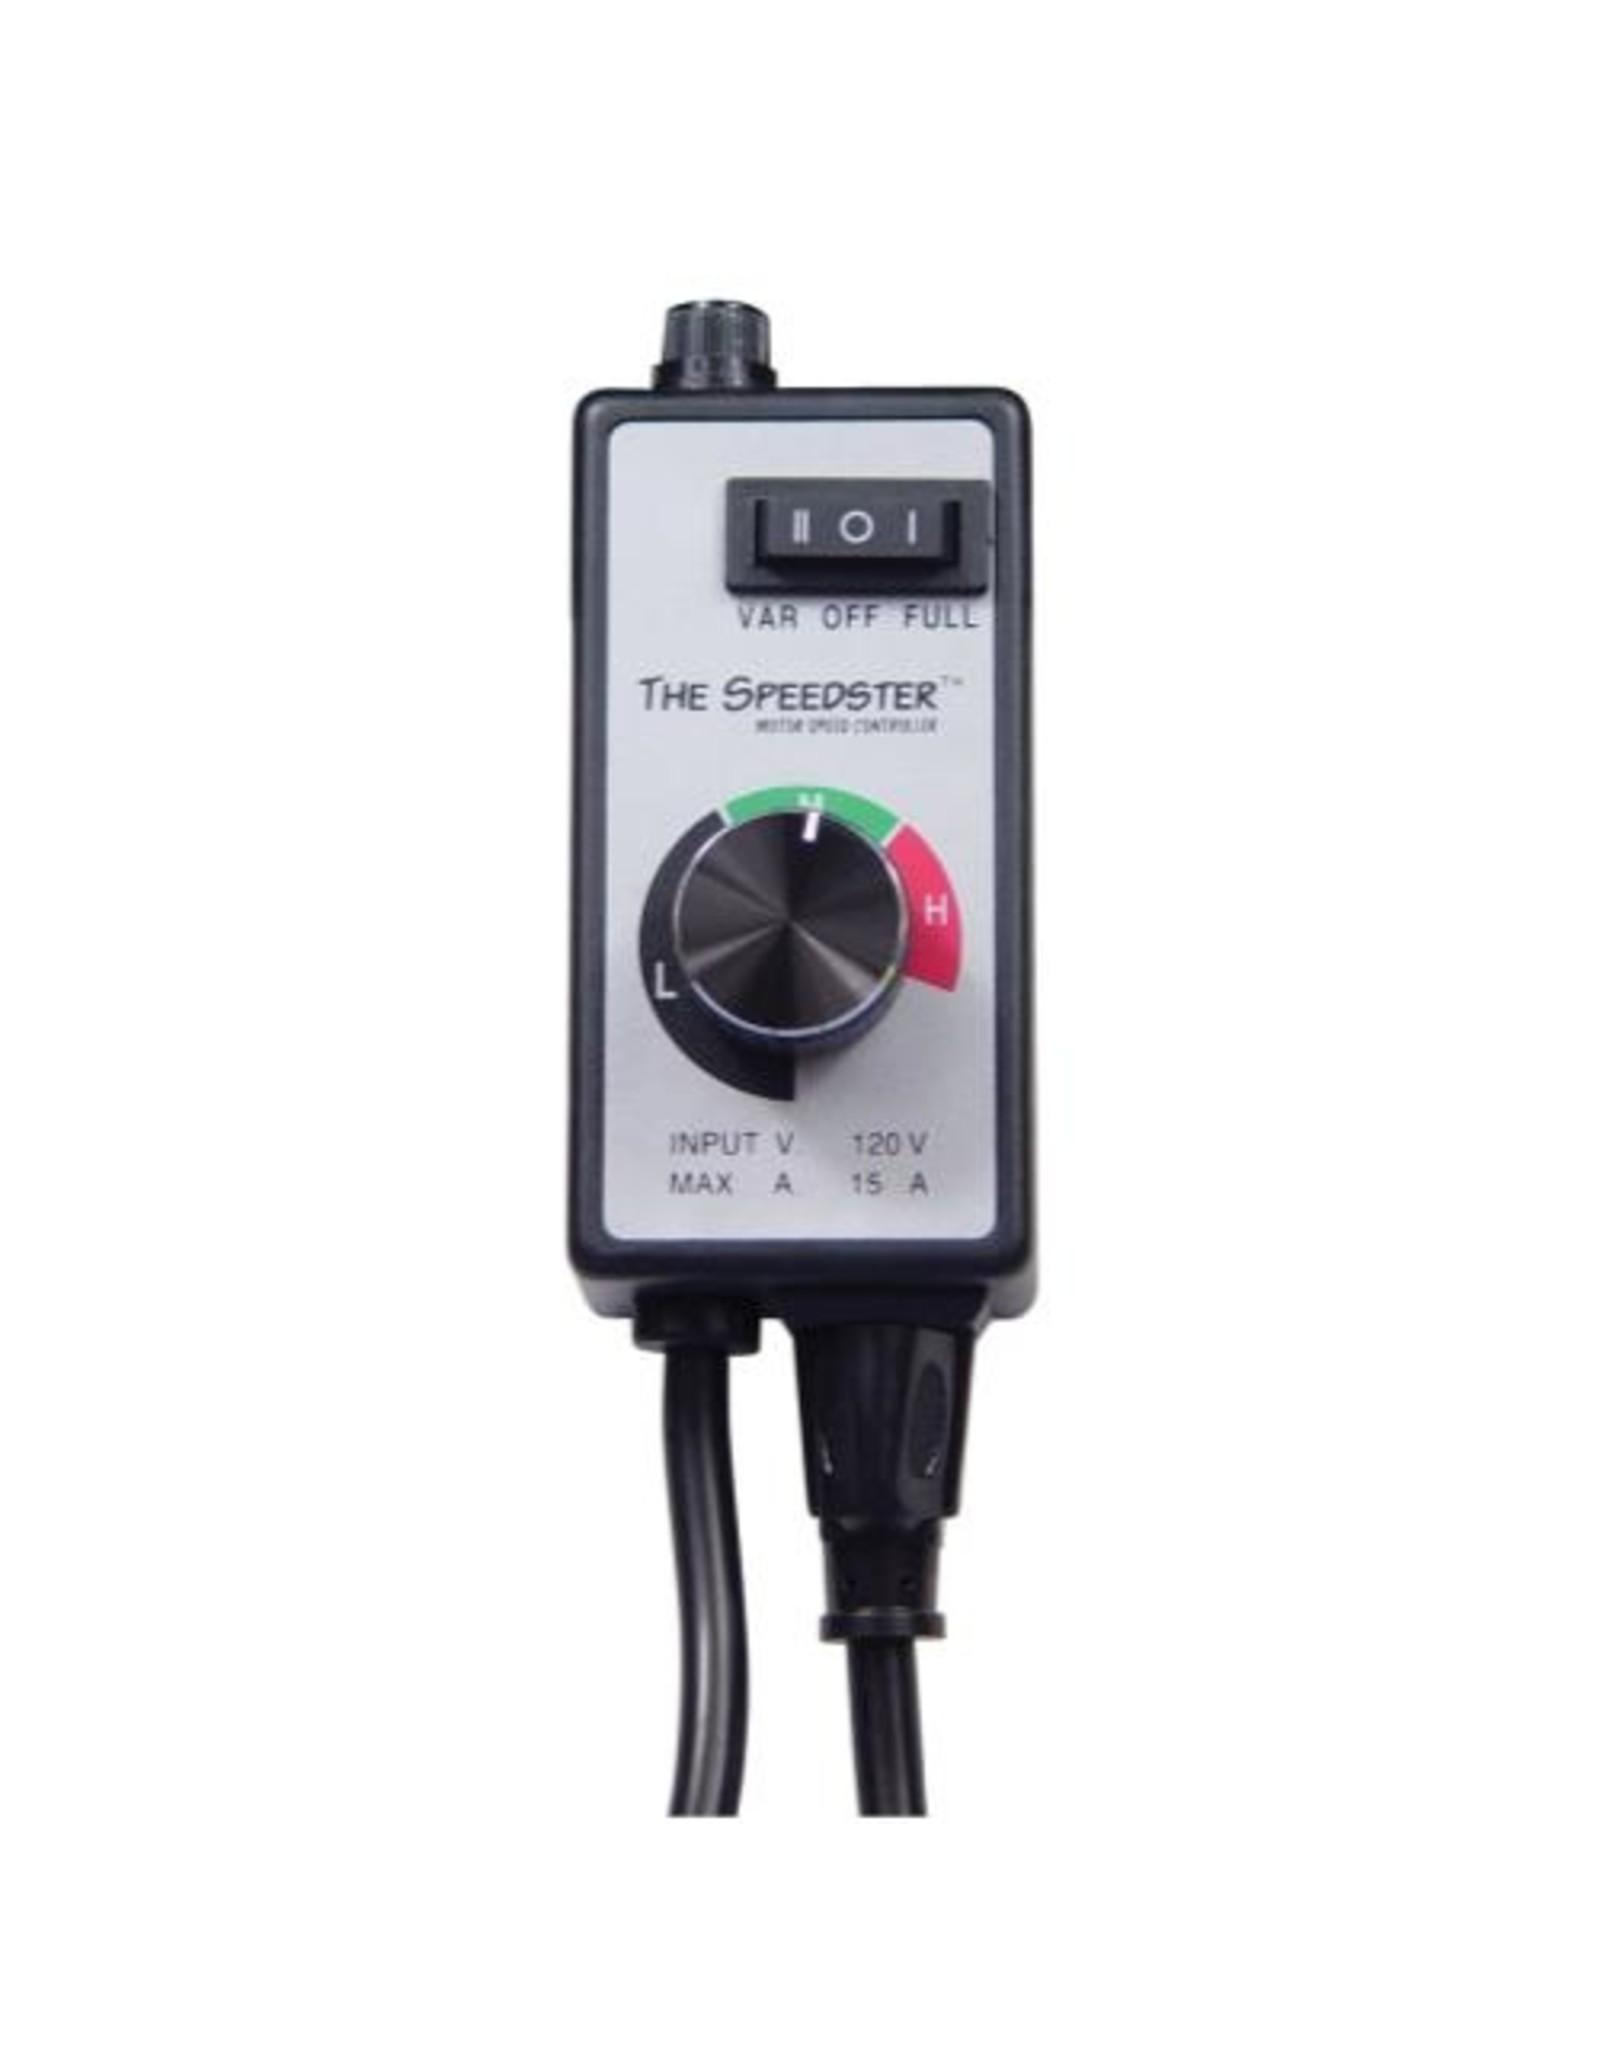 The Speedster - Motor Speed Controller